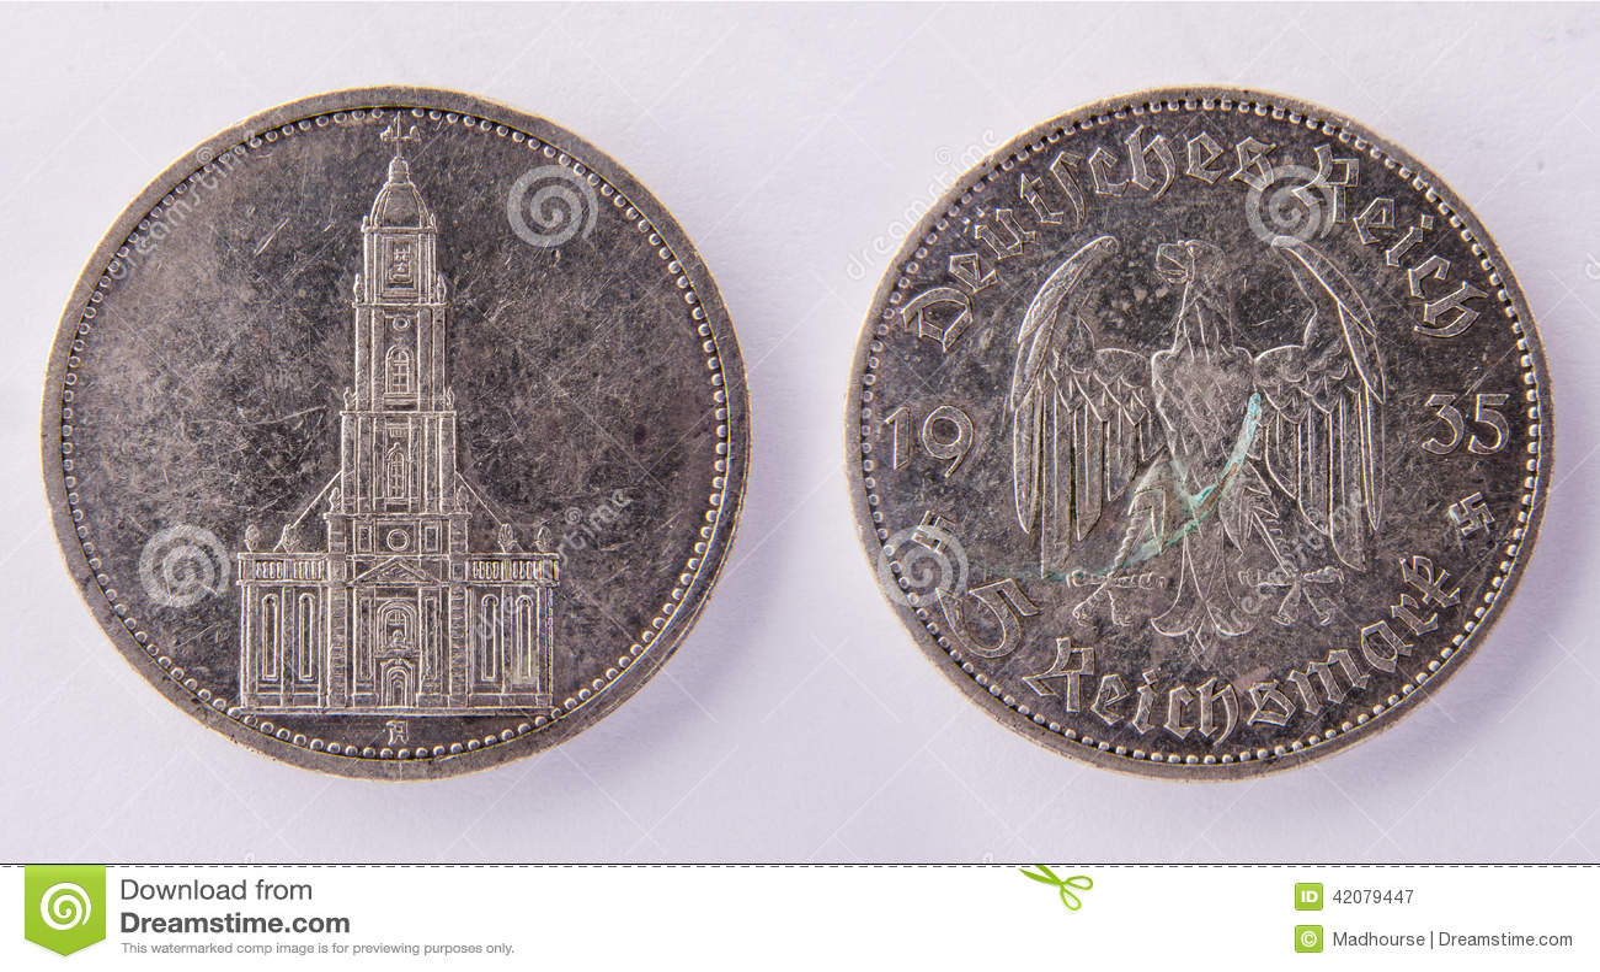 german coin 5 reichsmark 1935 stock photo image 42079447. Black Bedroom Furniture Sets. Home Design Ideas